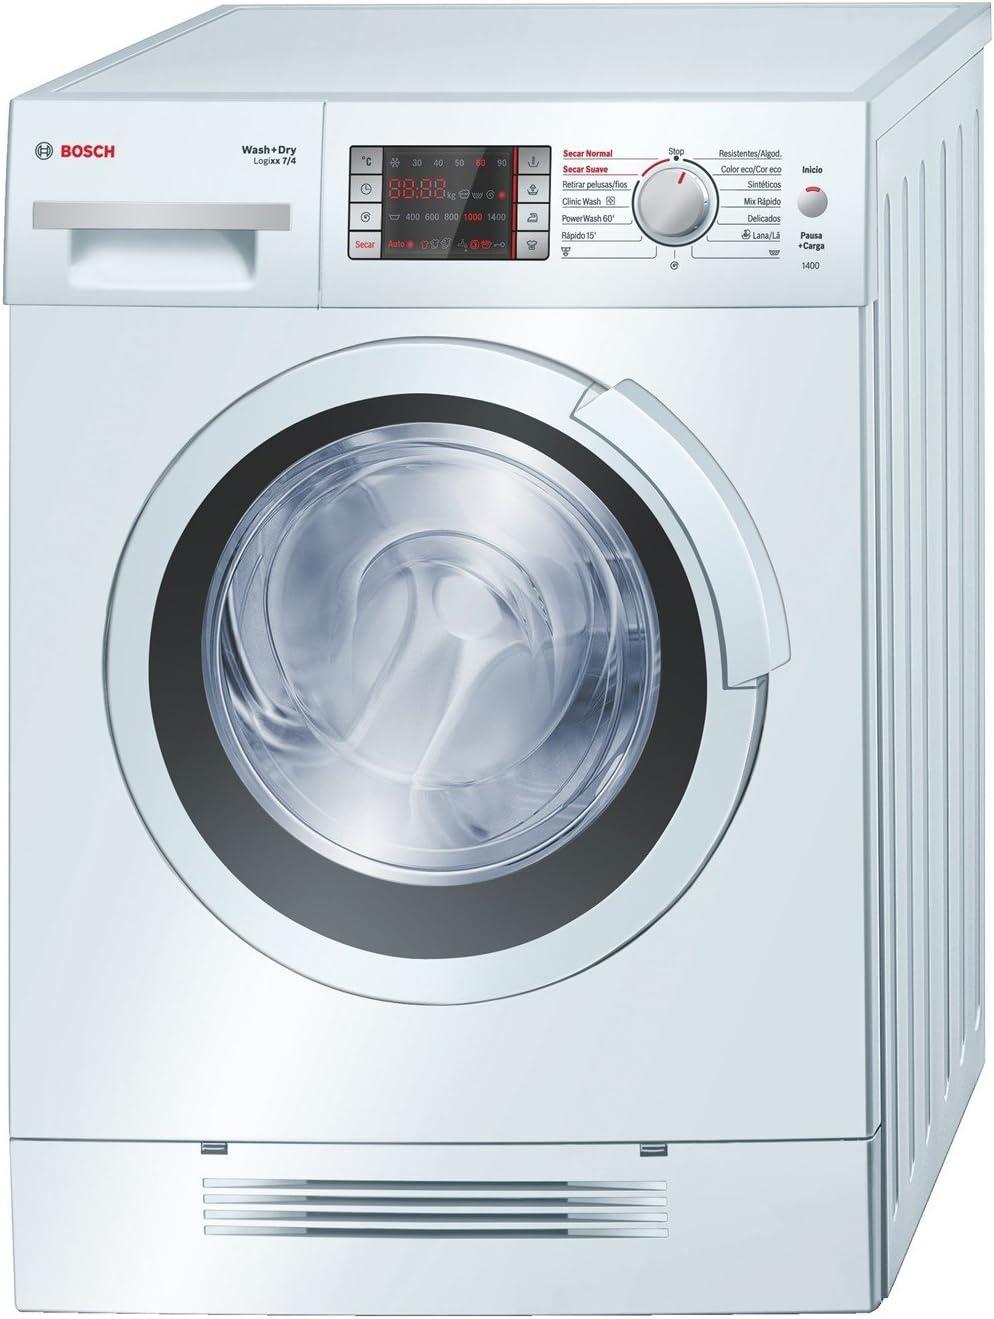 Bosch Logixx 7 WVH28460EE lavadora Carga frontal Independiente ...